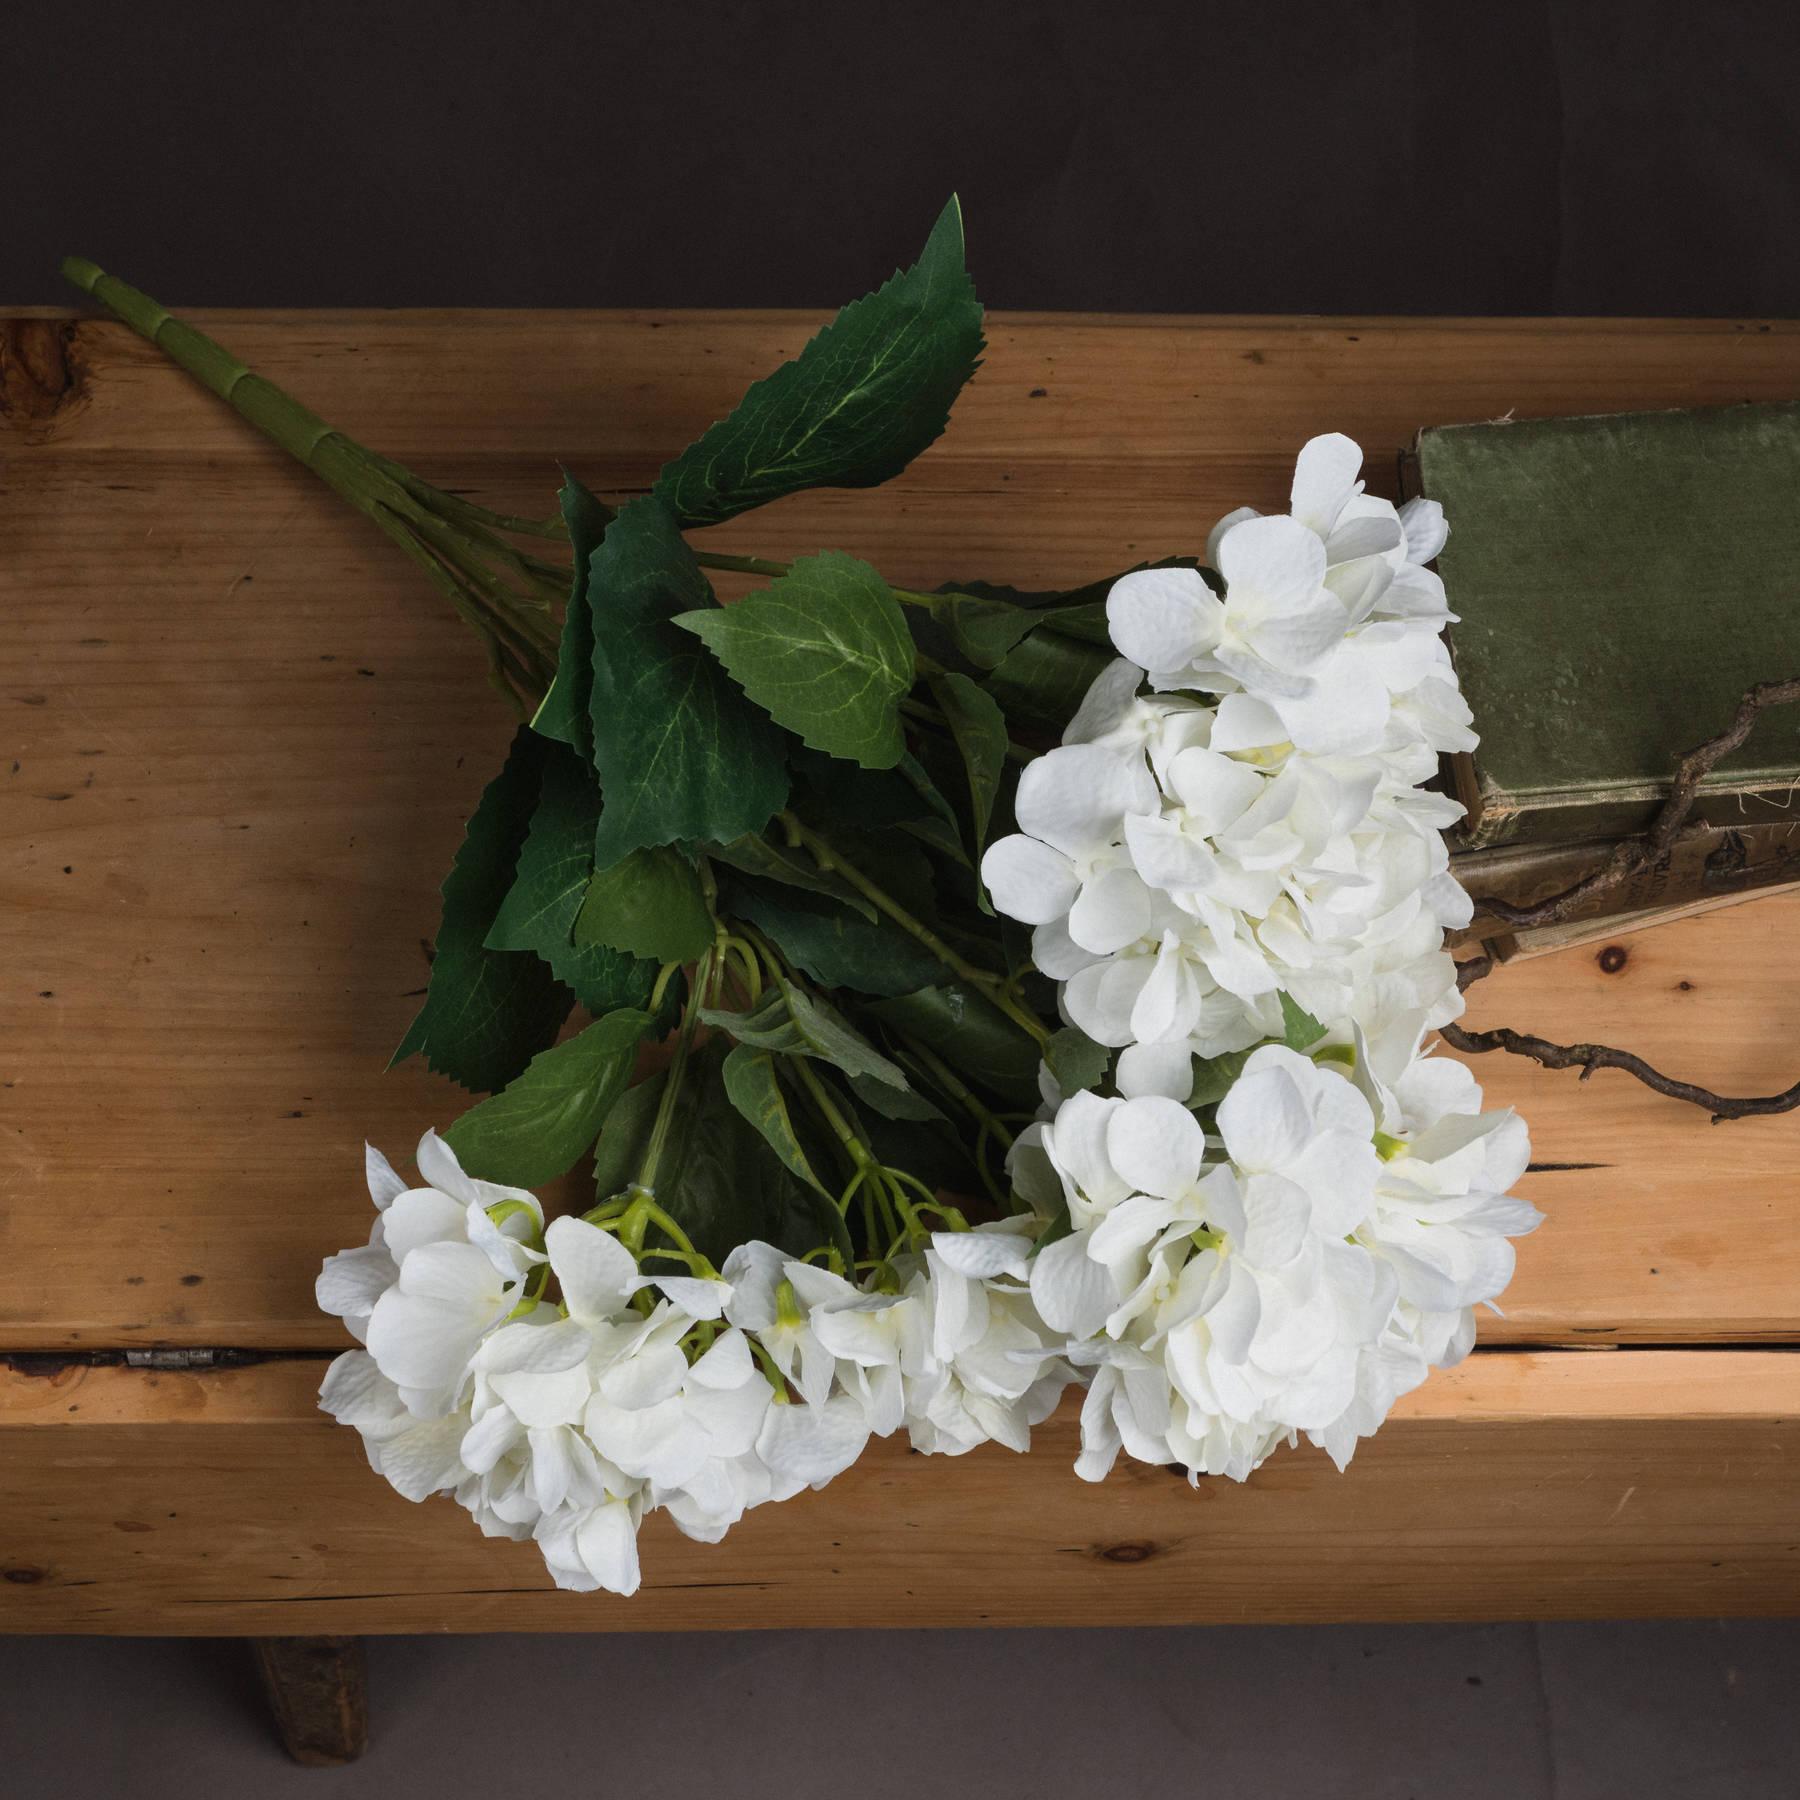 White Hydrangea Bouquet - Image 2